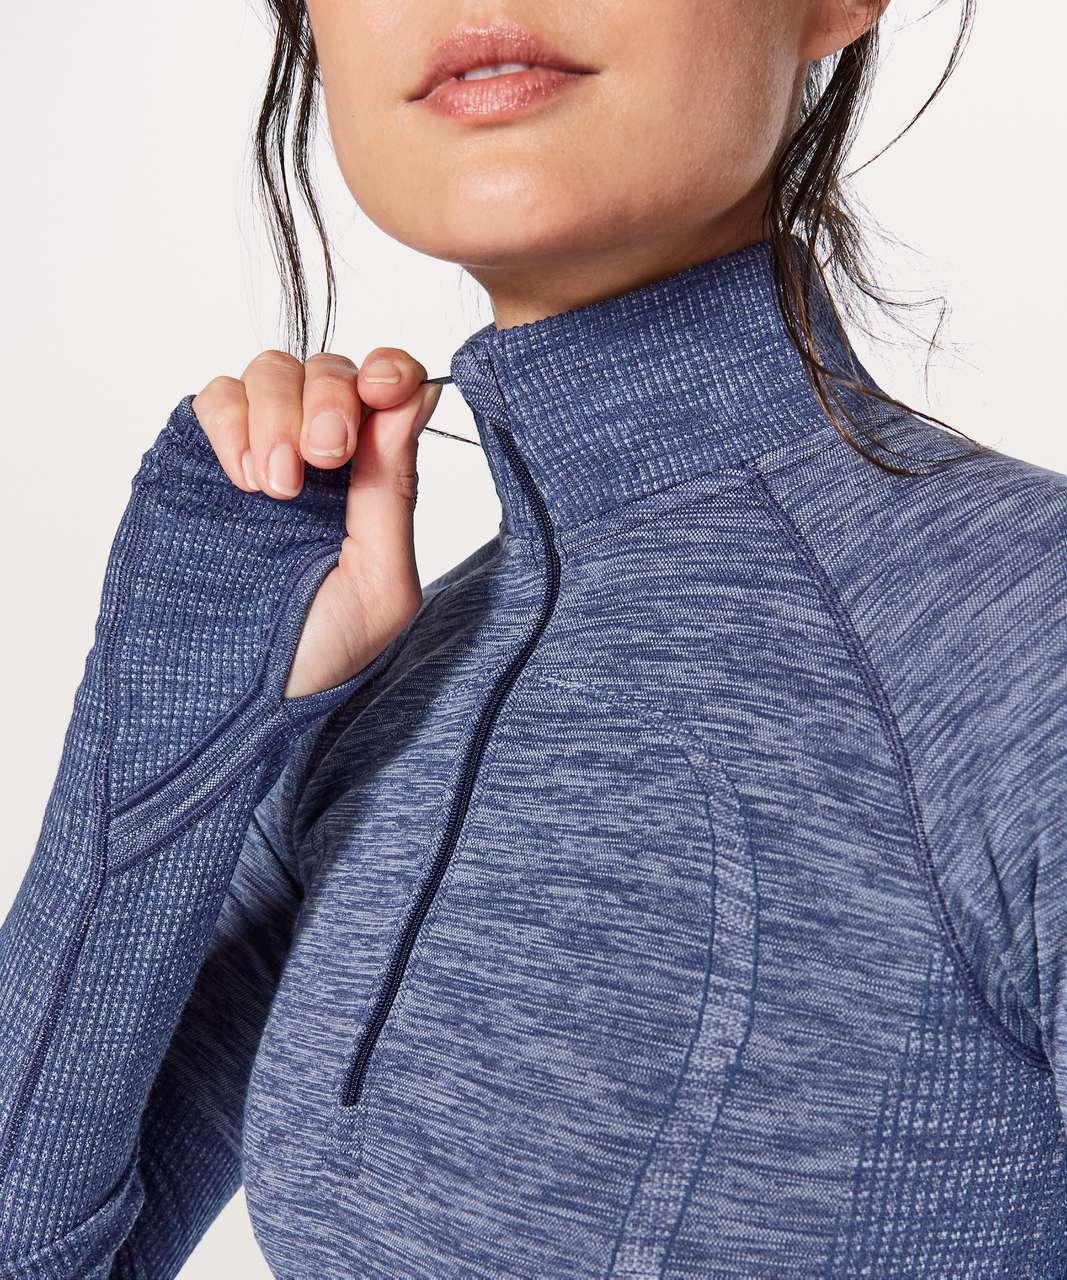 Lululemon Swiftly Wool 1/2 Zip - Hero Blue / White